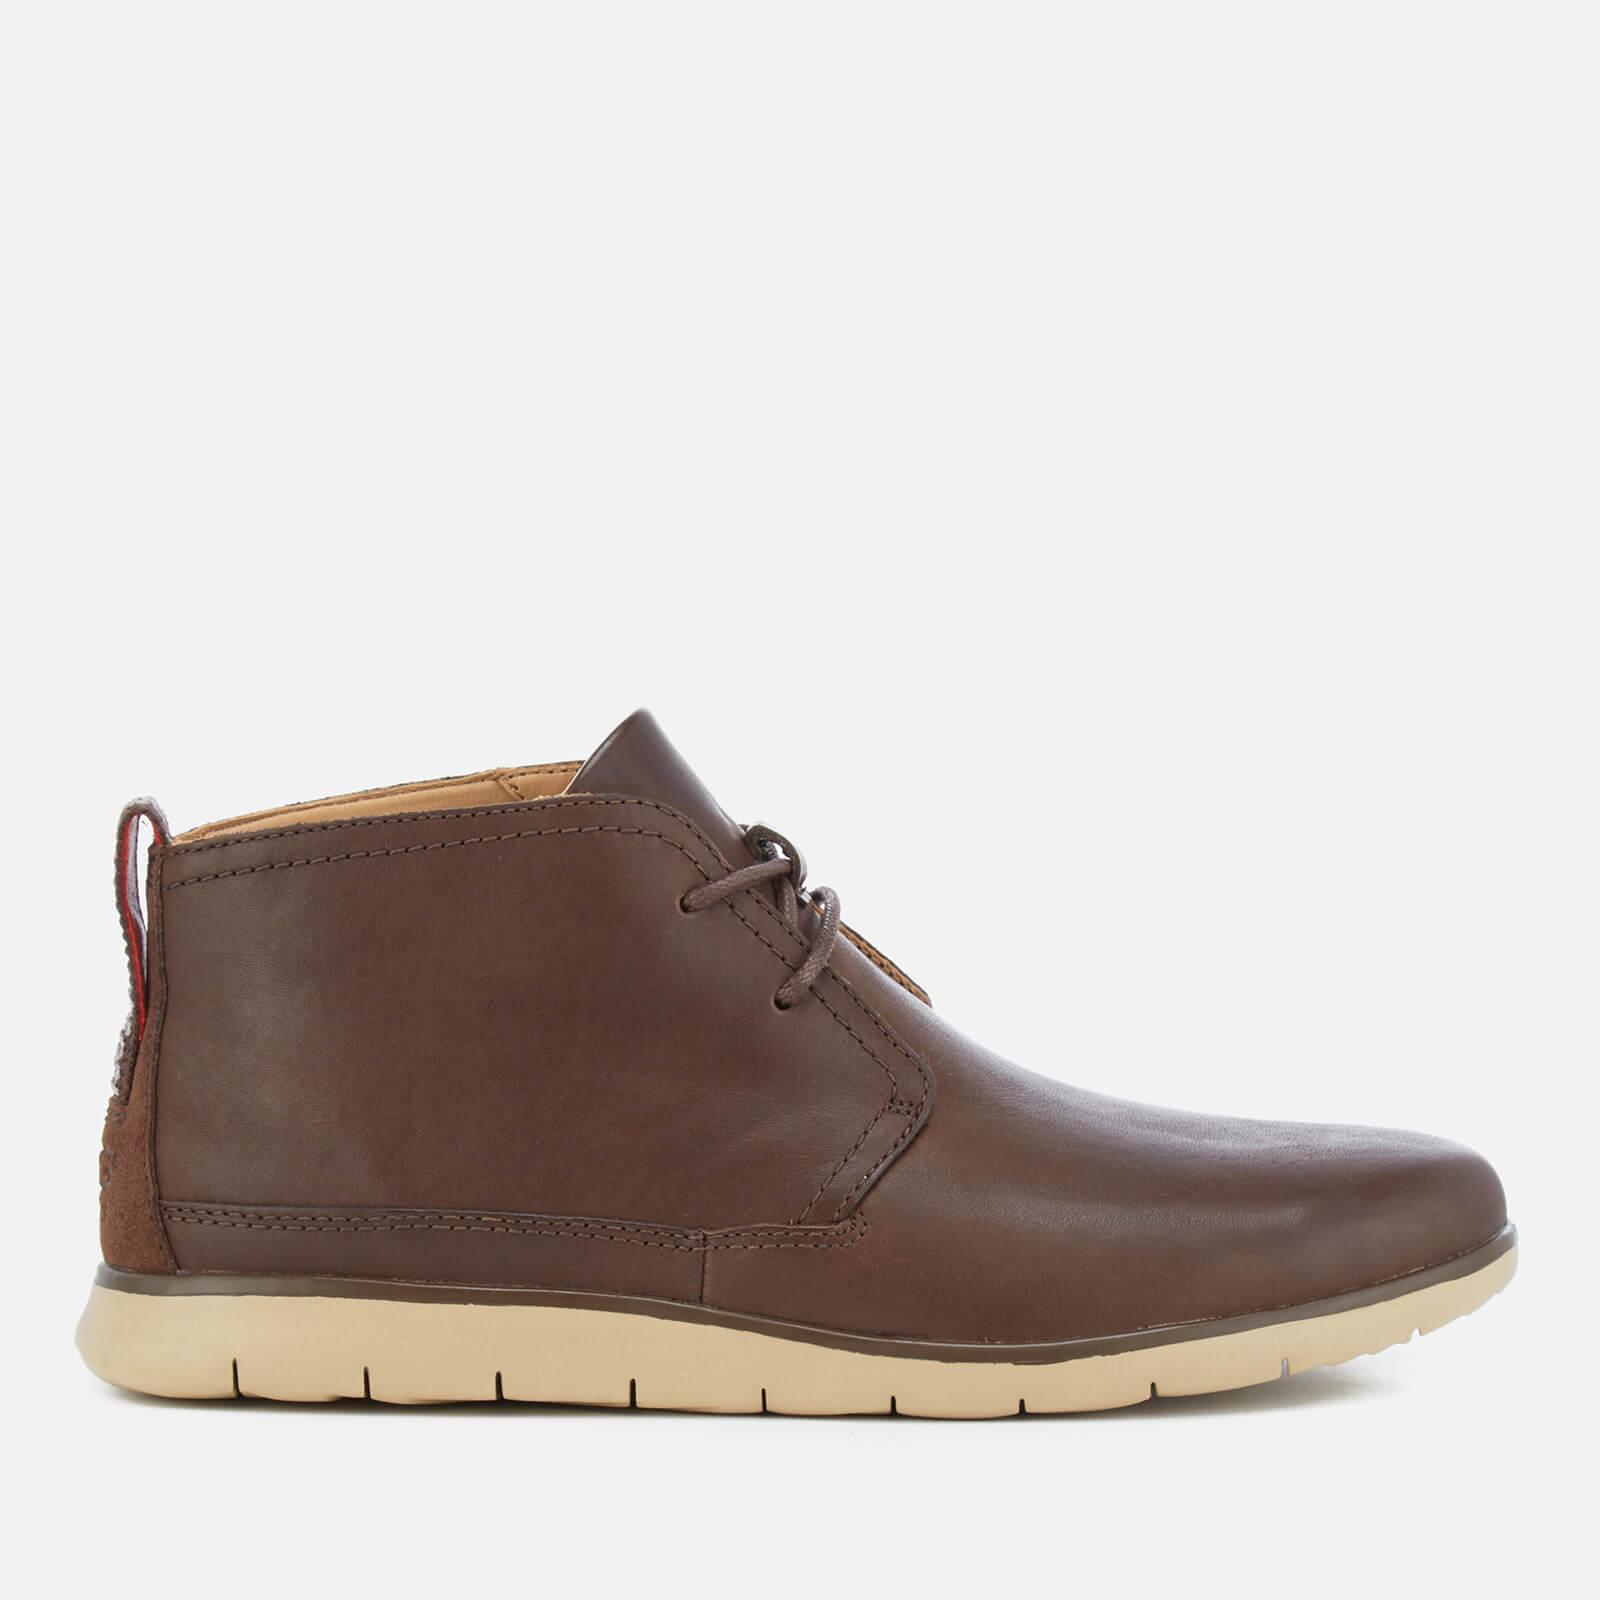 22aa10702f4 UGG Men's Freamon Waterproof Chukka Boots - Grizzly